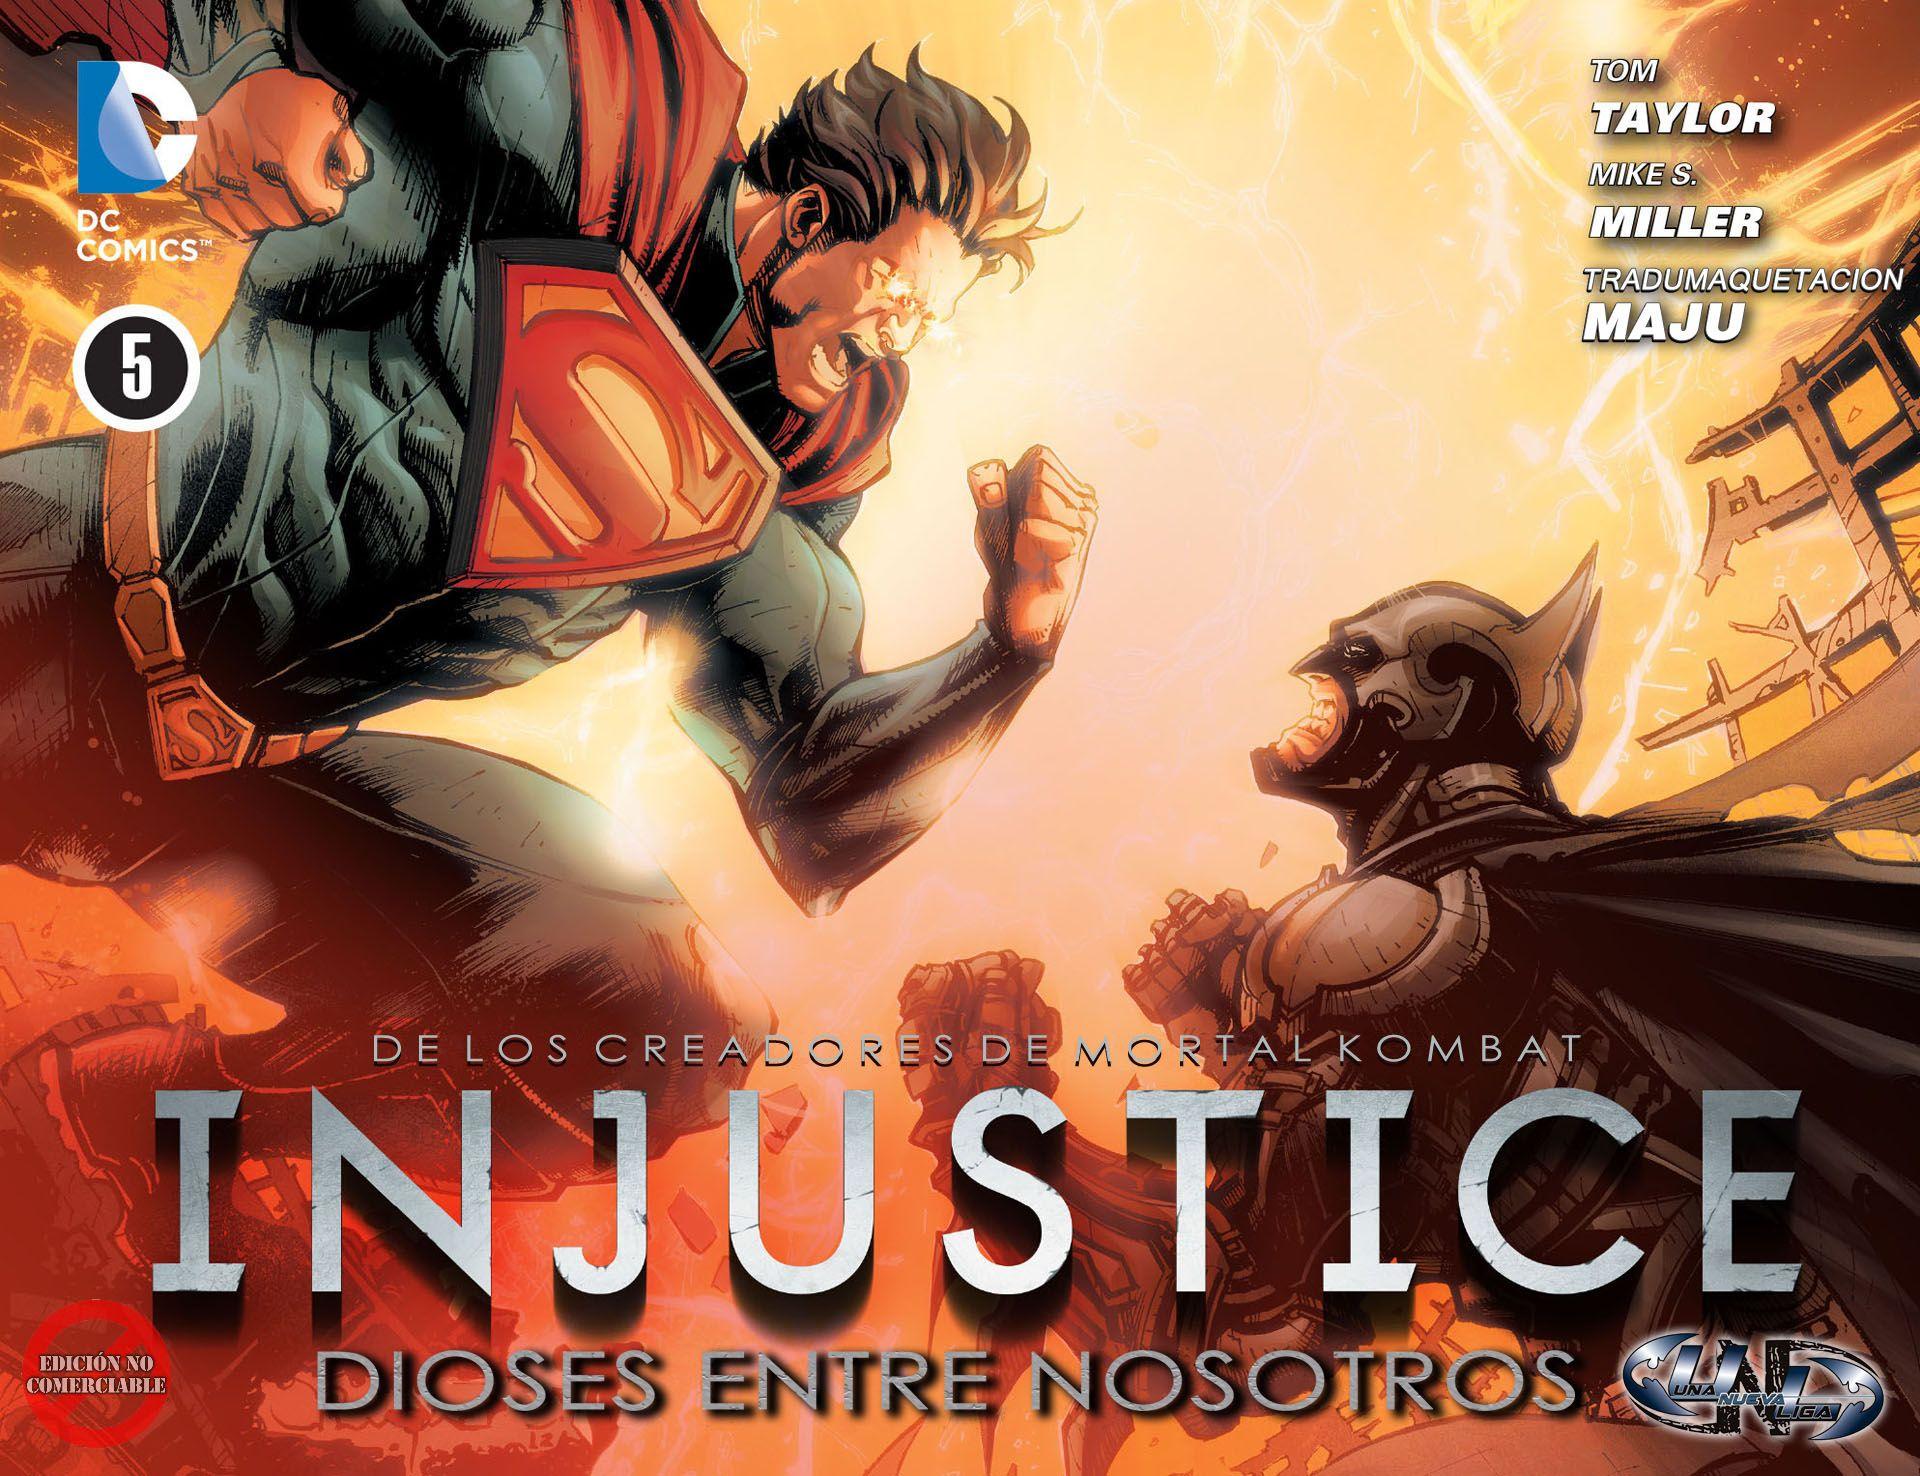 Superman vs Batman Injustice Gods among us Marvel